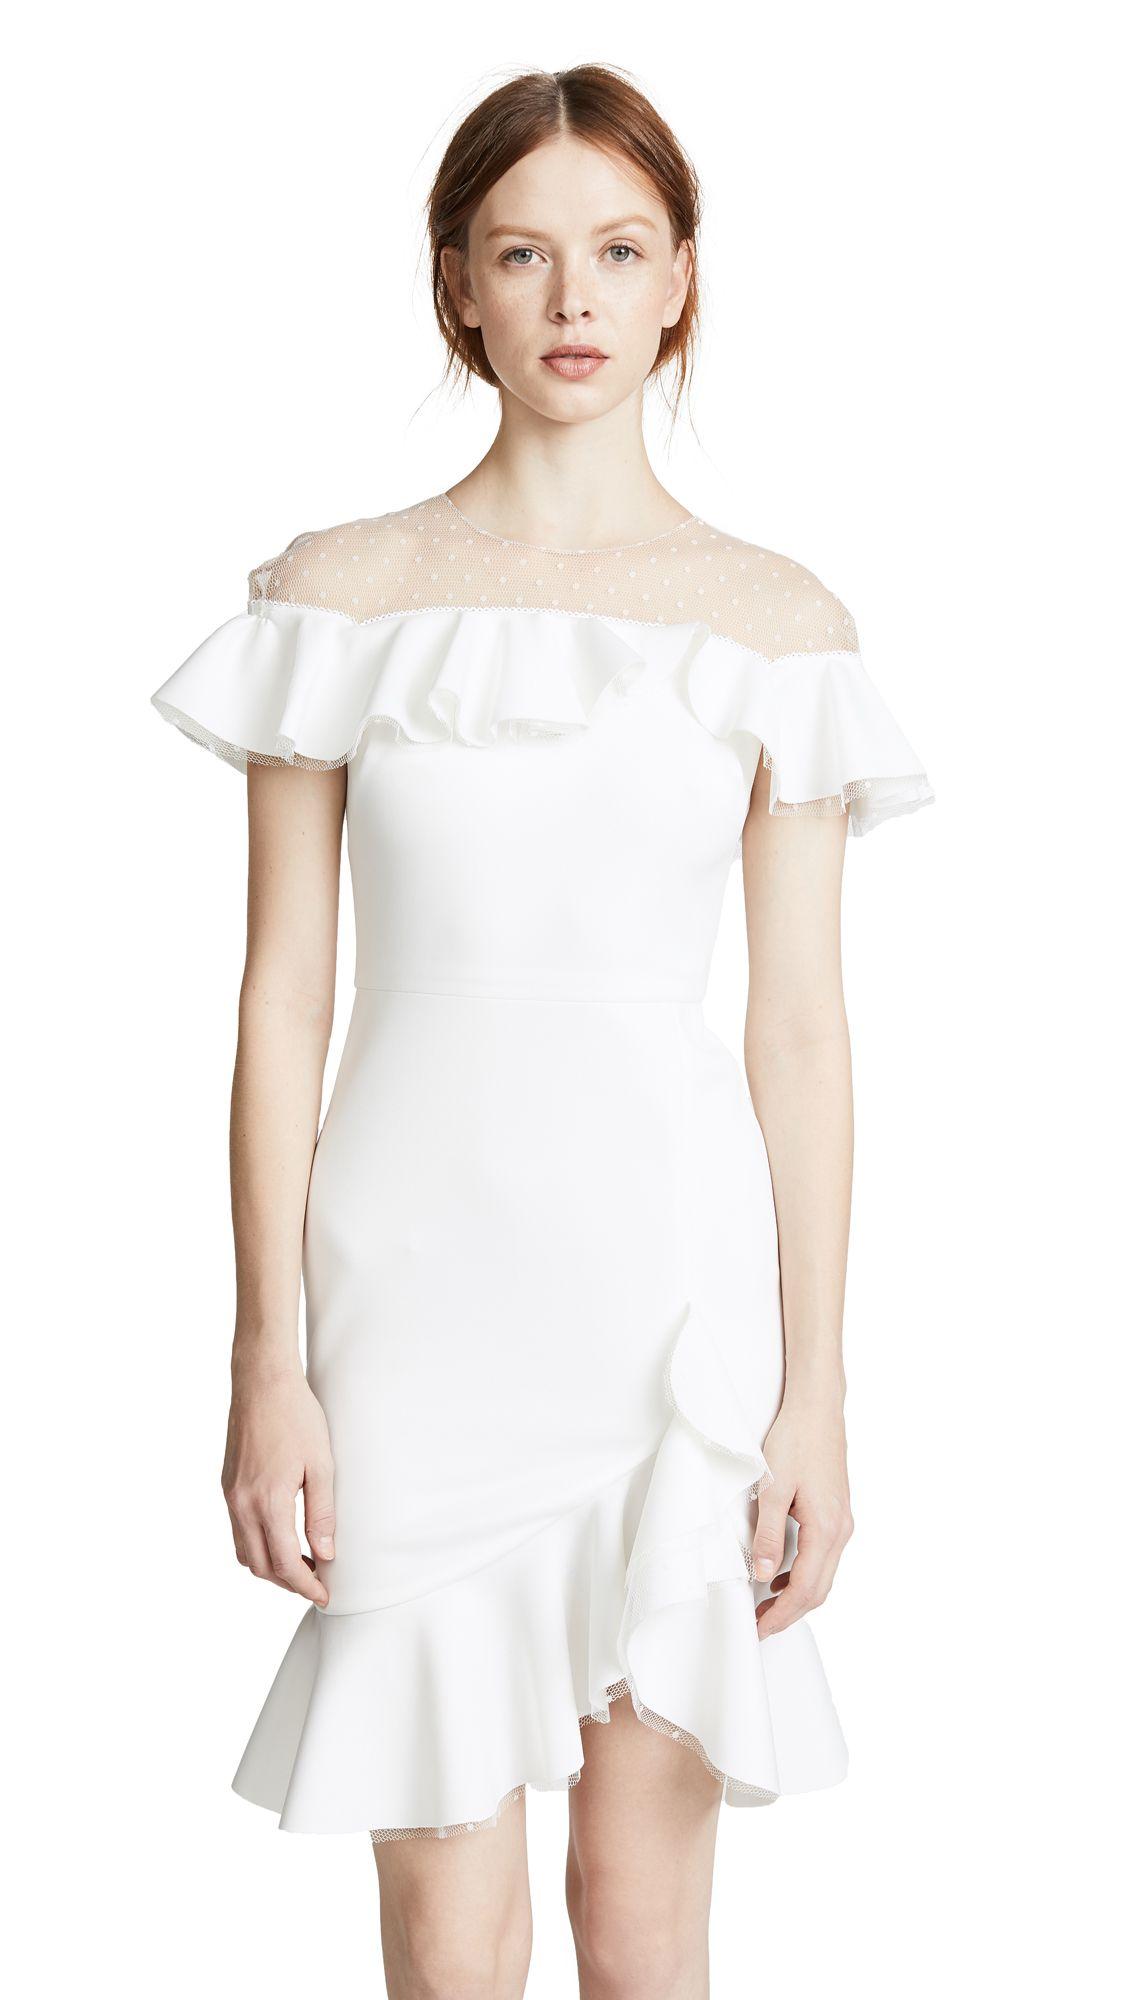 MARCHESA NOTTE NEOPRENE COCKTAIL DRESS WITH POINT D'ESPRIT YOKE & RUFFLES. #marchesanotte #cloth #